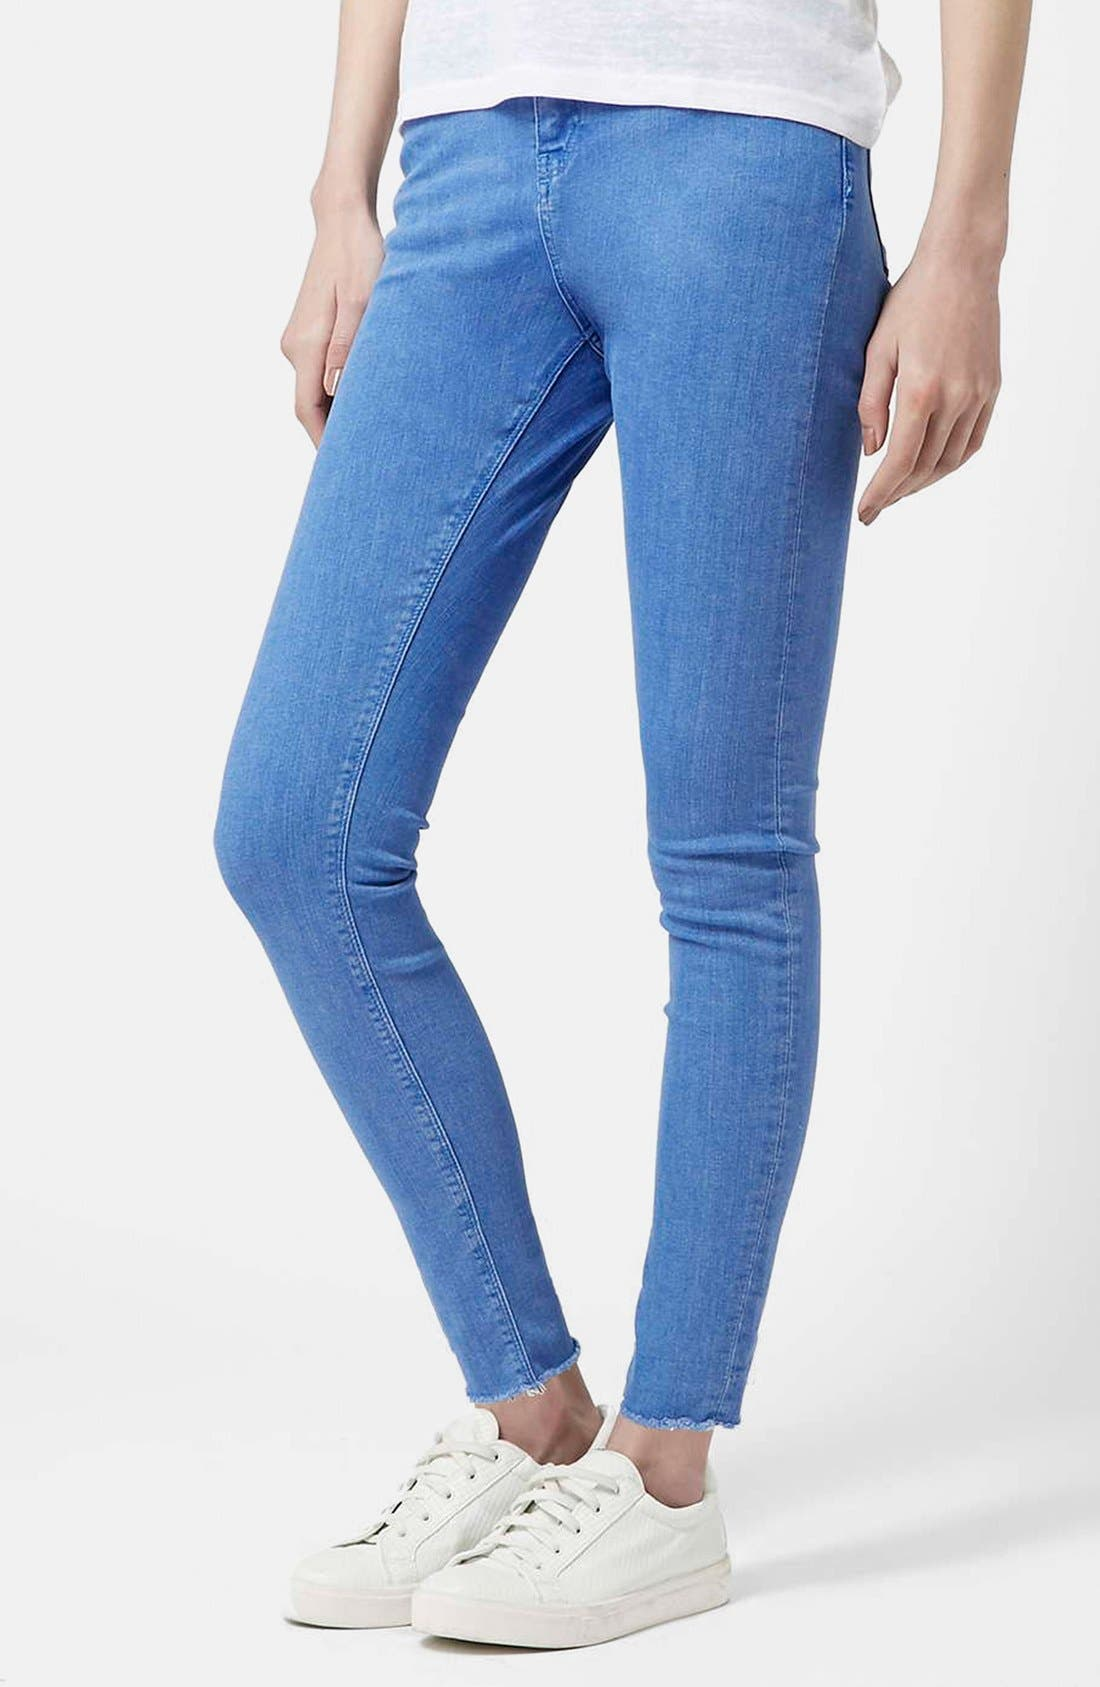 Alternate Image 1 Selected - Topshop Moto 'Jamie' High Waist Skinny Jeans (Blue) (Short)